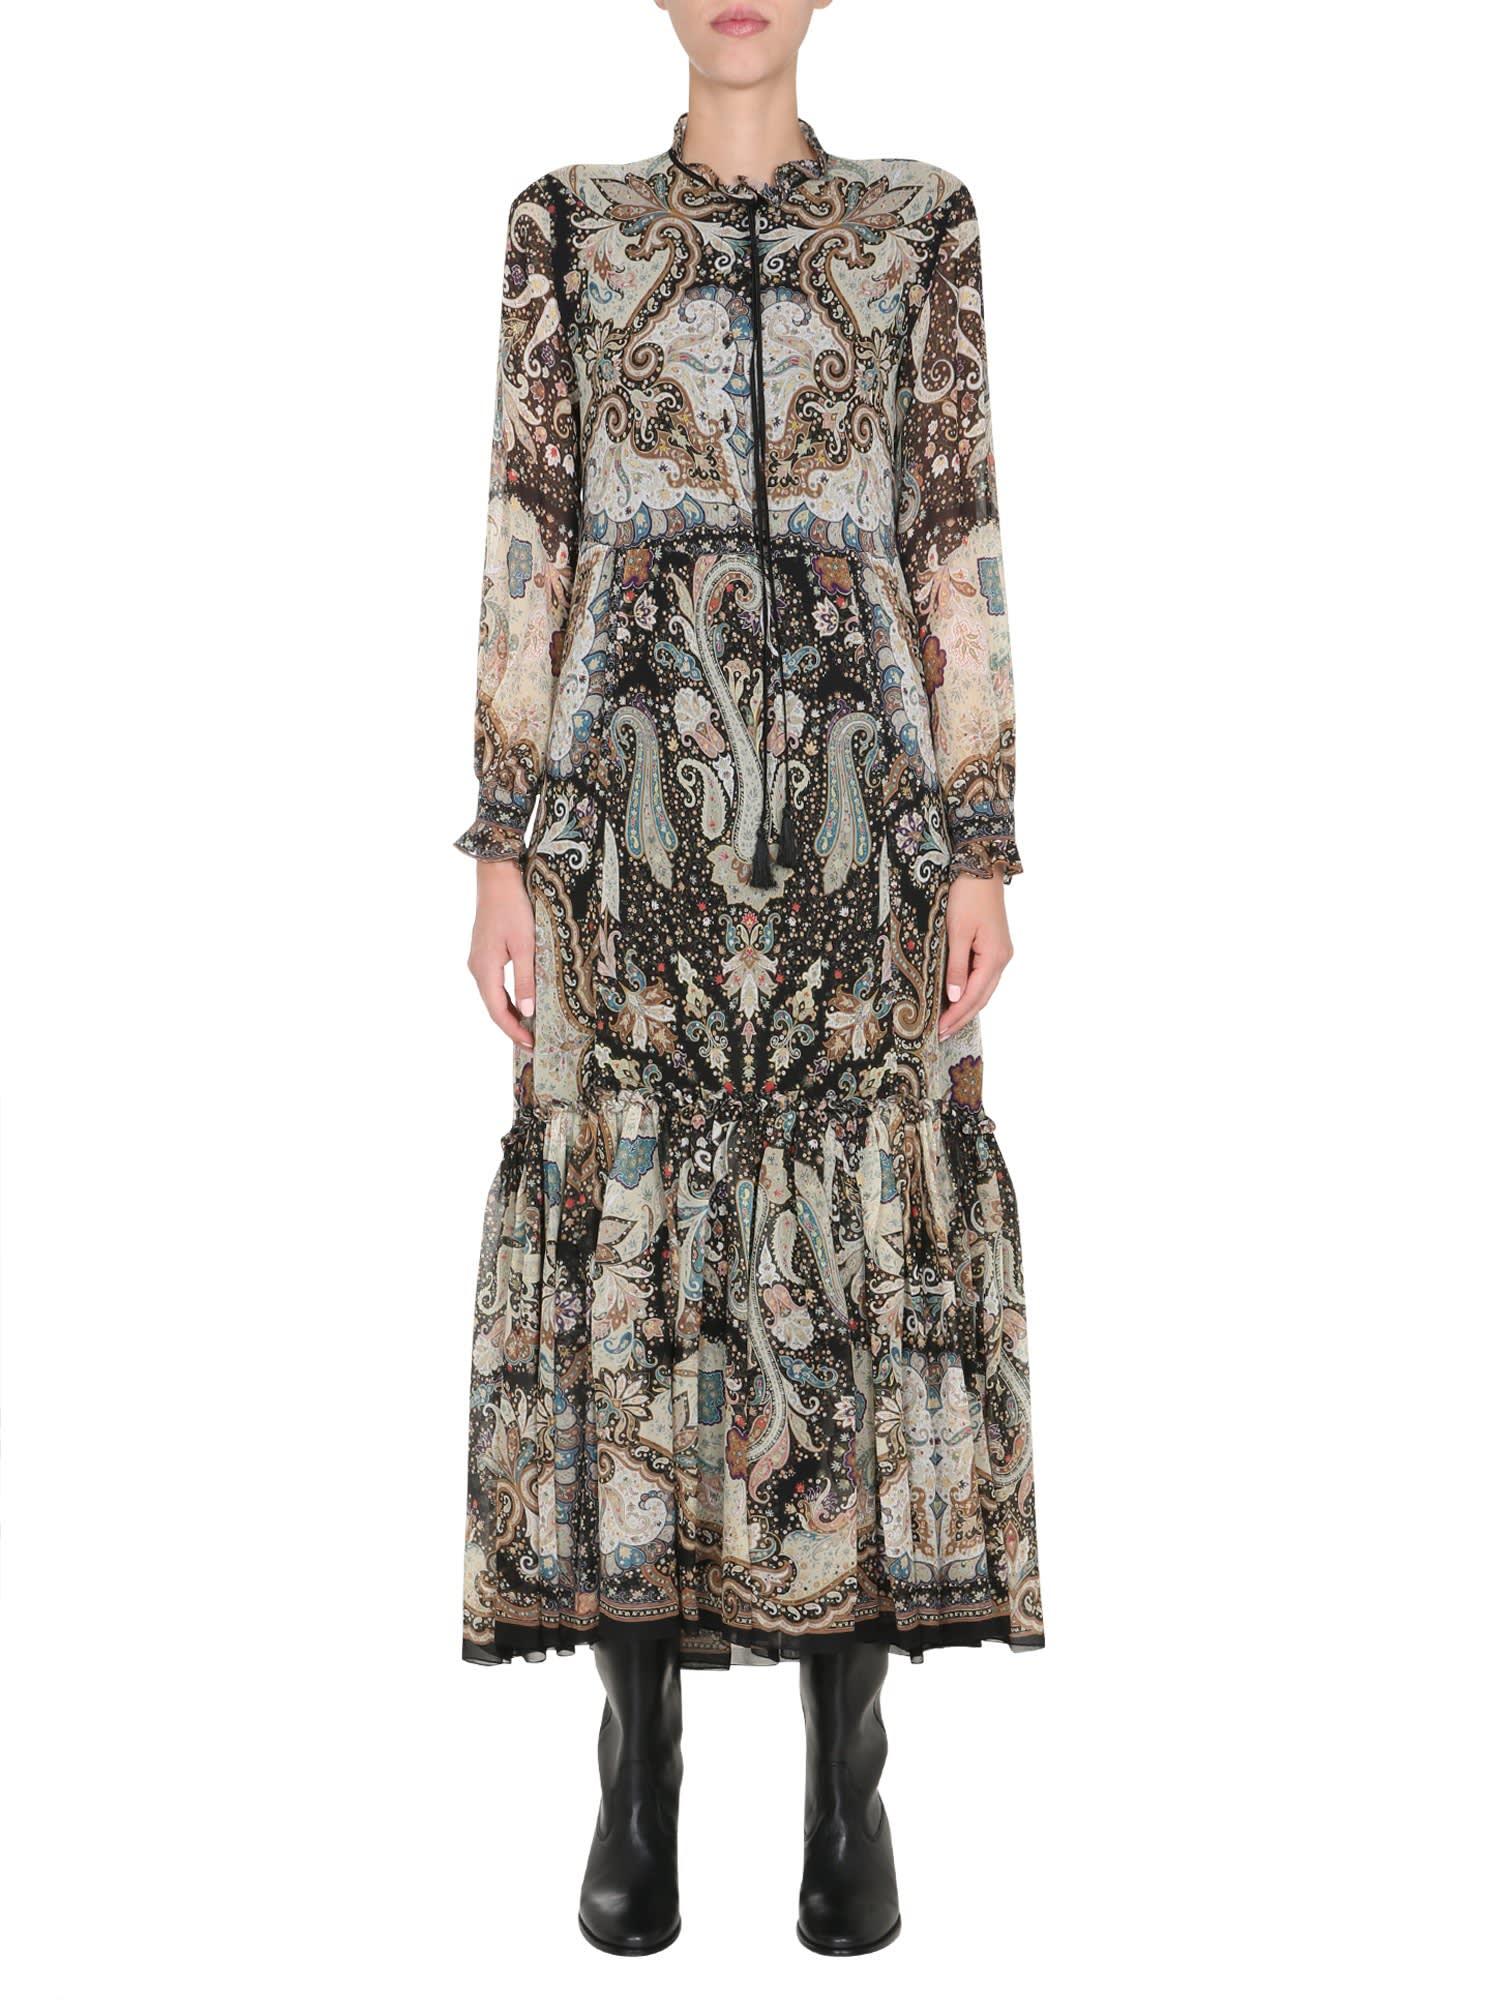 Etro Silks SILK DRESS